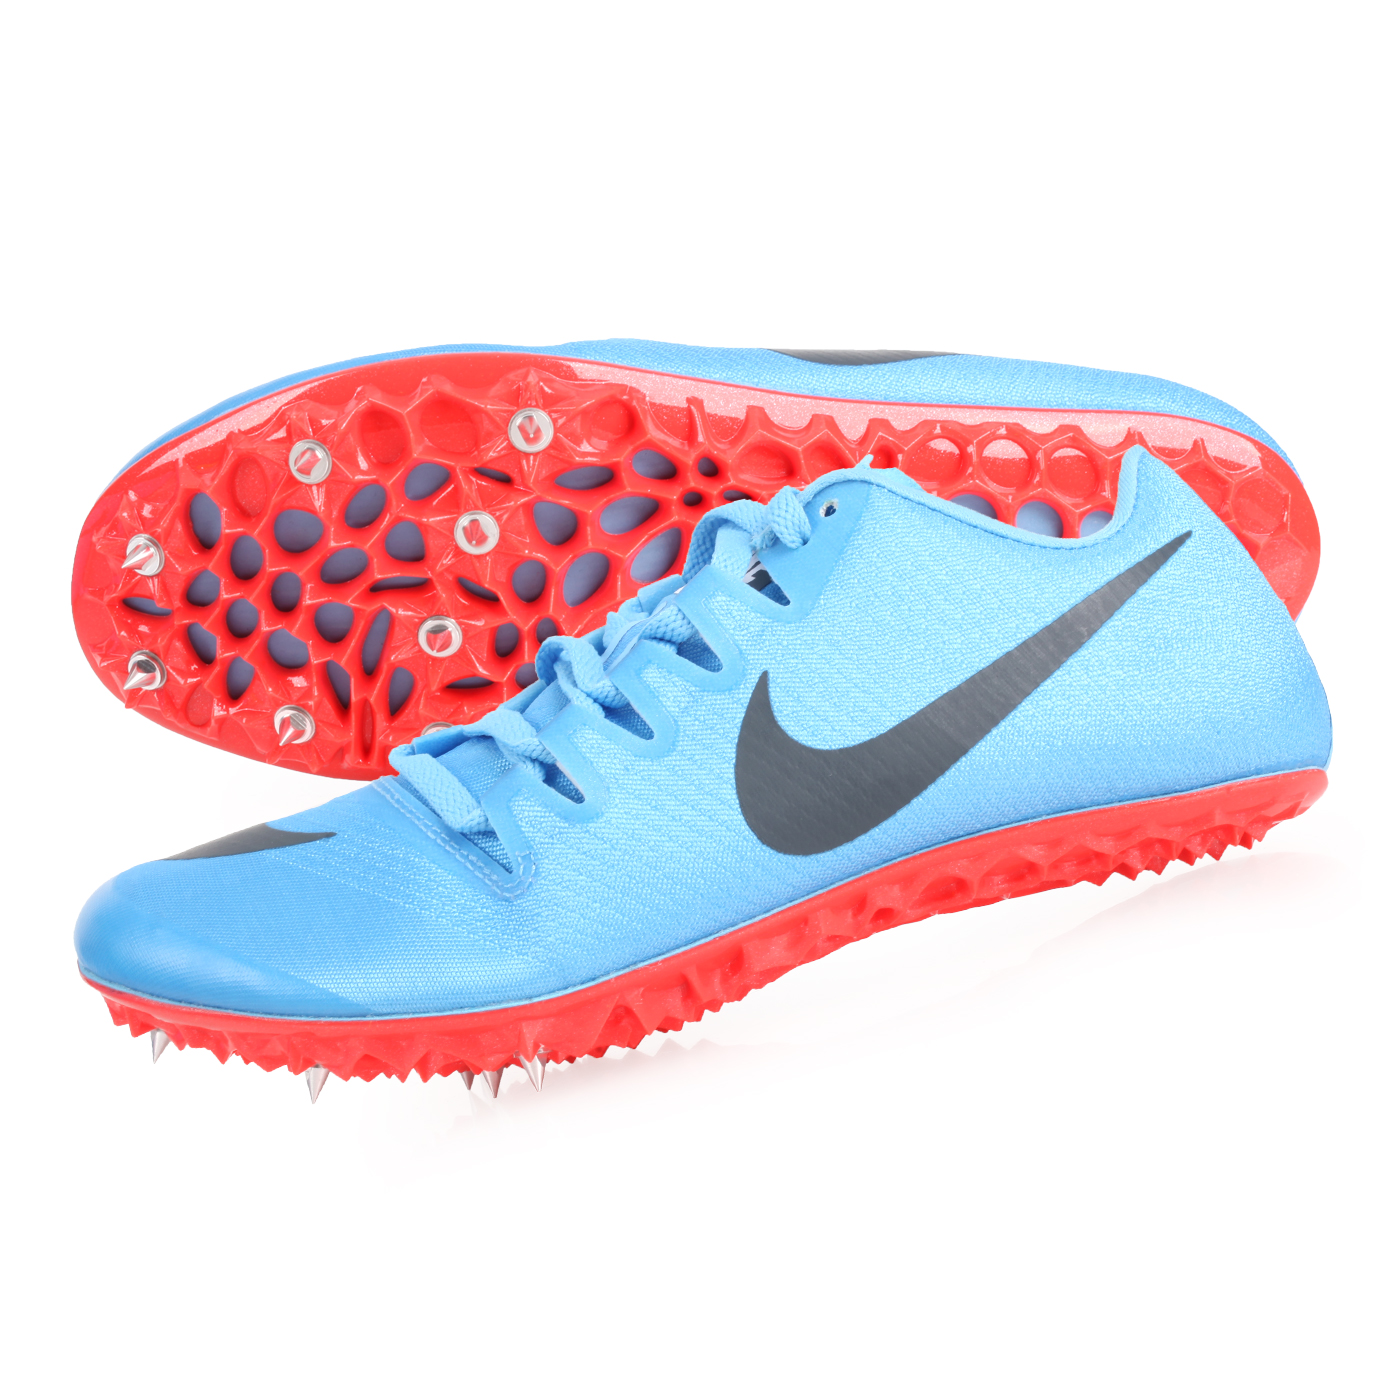 NIKE 田徑釘鞋(短距離)  @ZOOM JA FLY 3@865633001 - 水藍黑